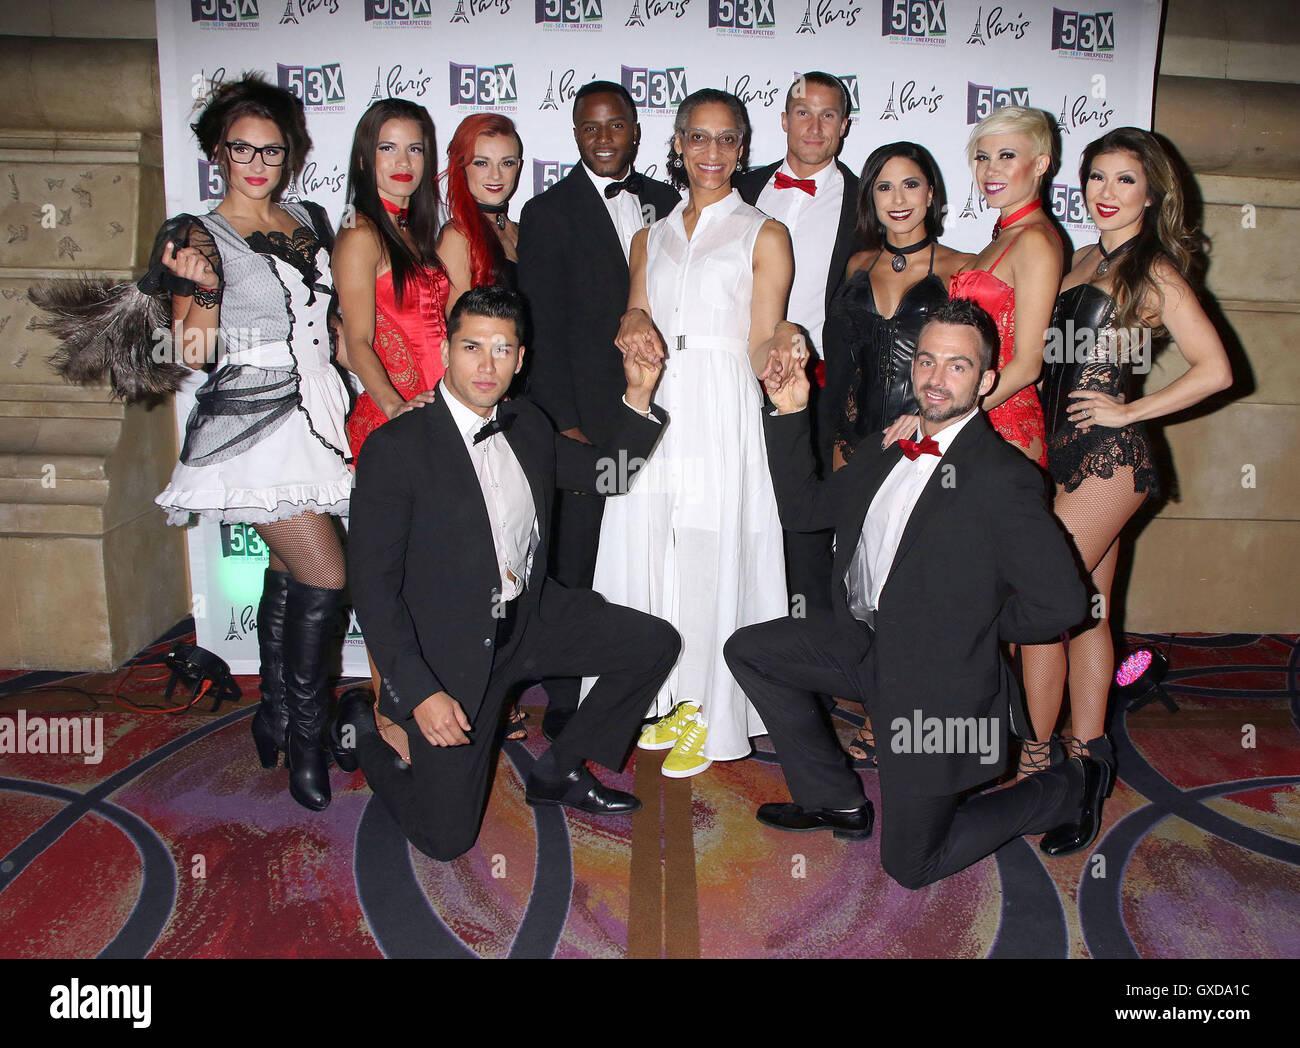 Carla Hall Celebrates Her Husband Matthew Lyons 50th Birthday At 53X Inside Paris Hotel Casino Featuring Where Las Vegas Nevada